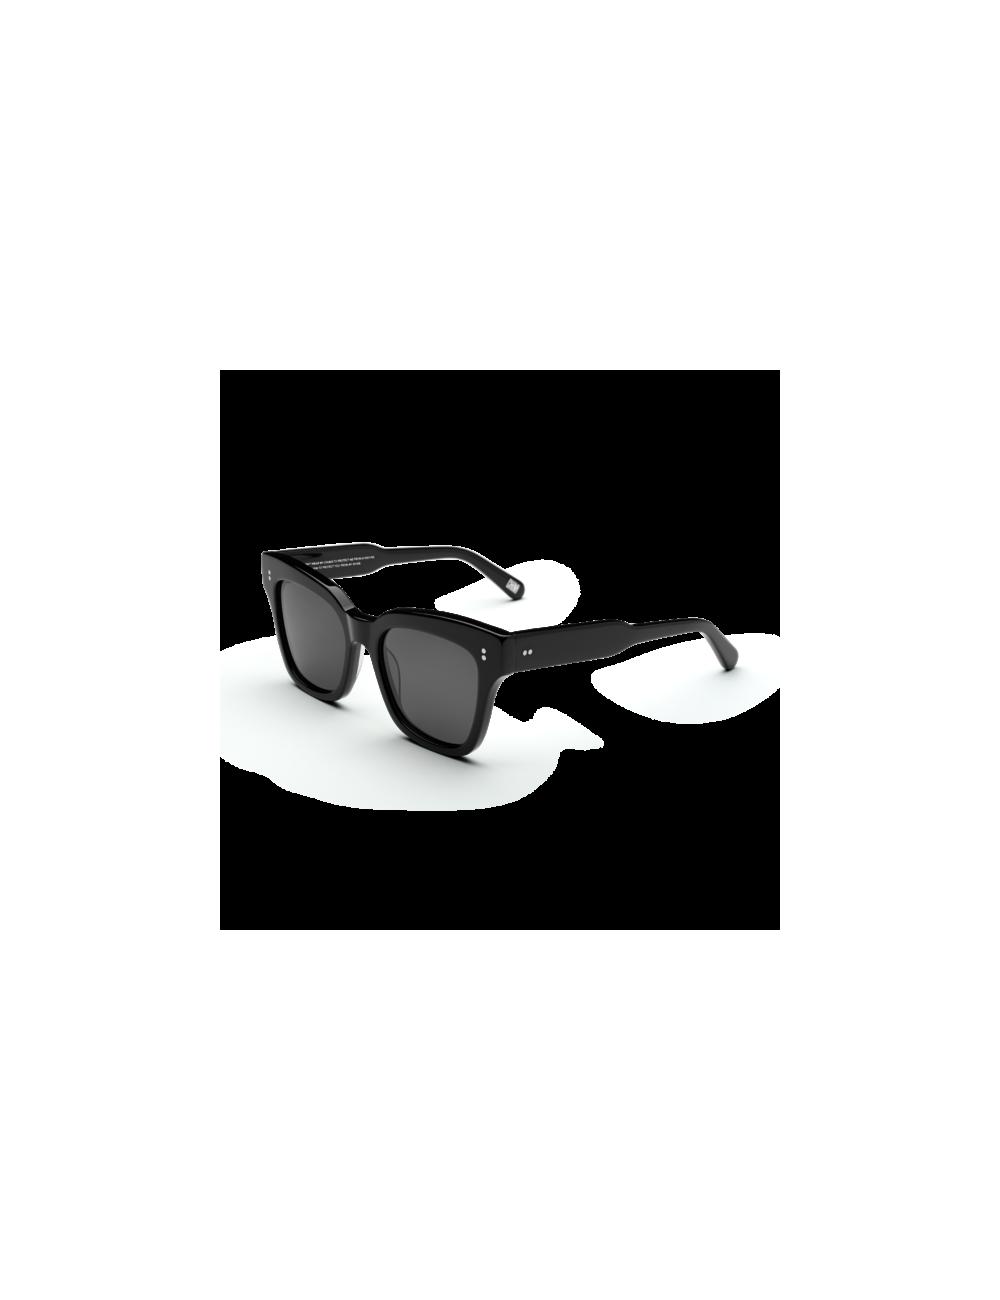 Chimi Eyewear - Model 005...